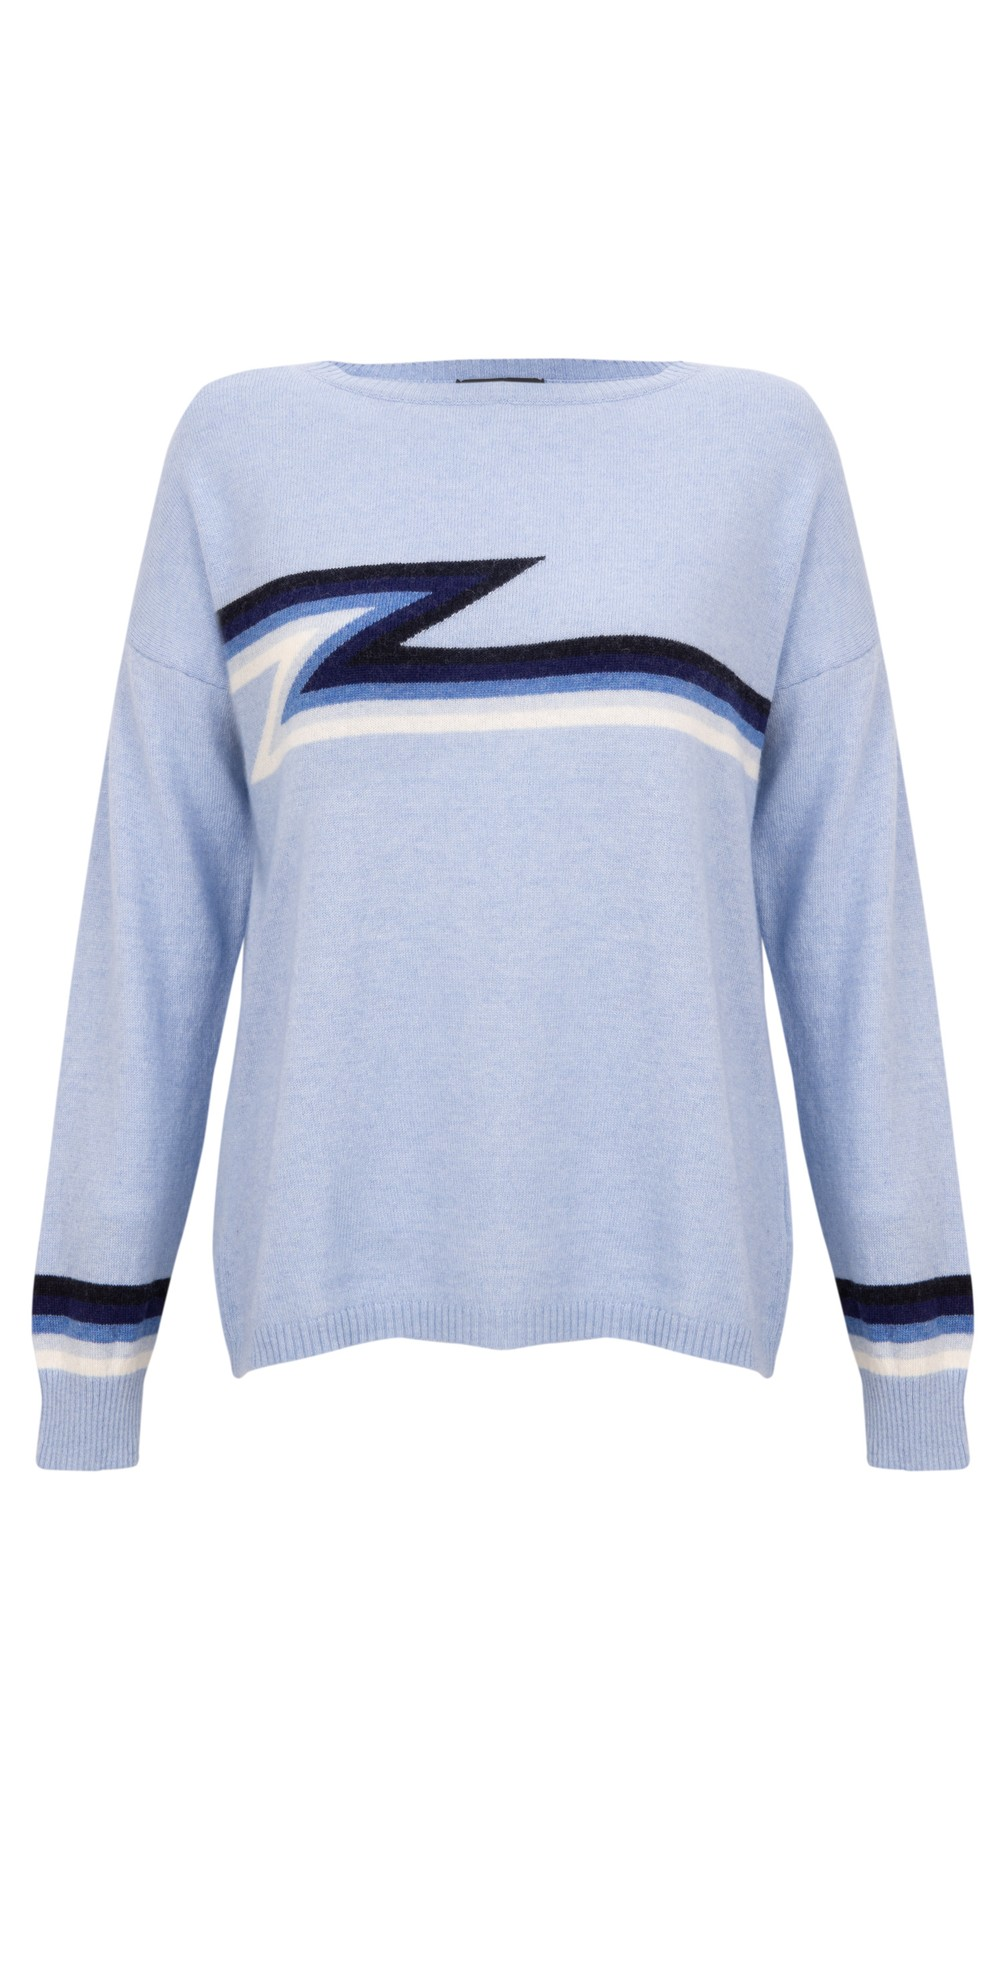 Ziggy Cashmere Blend Lightning Zig Zag Jumper  main image